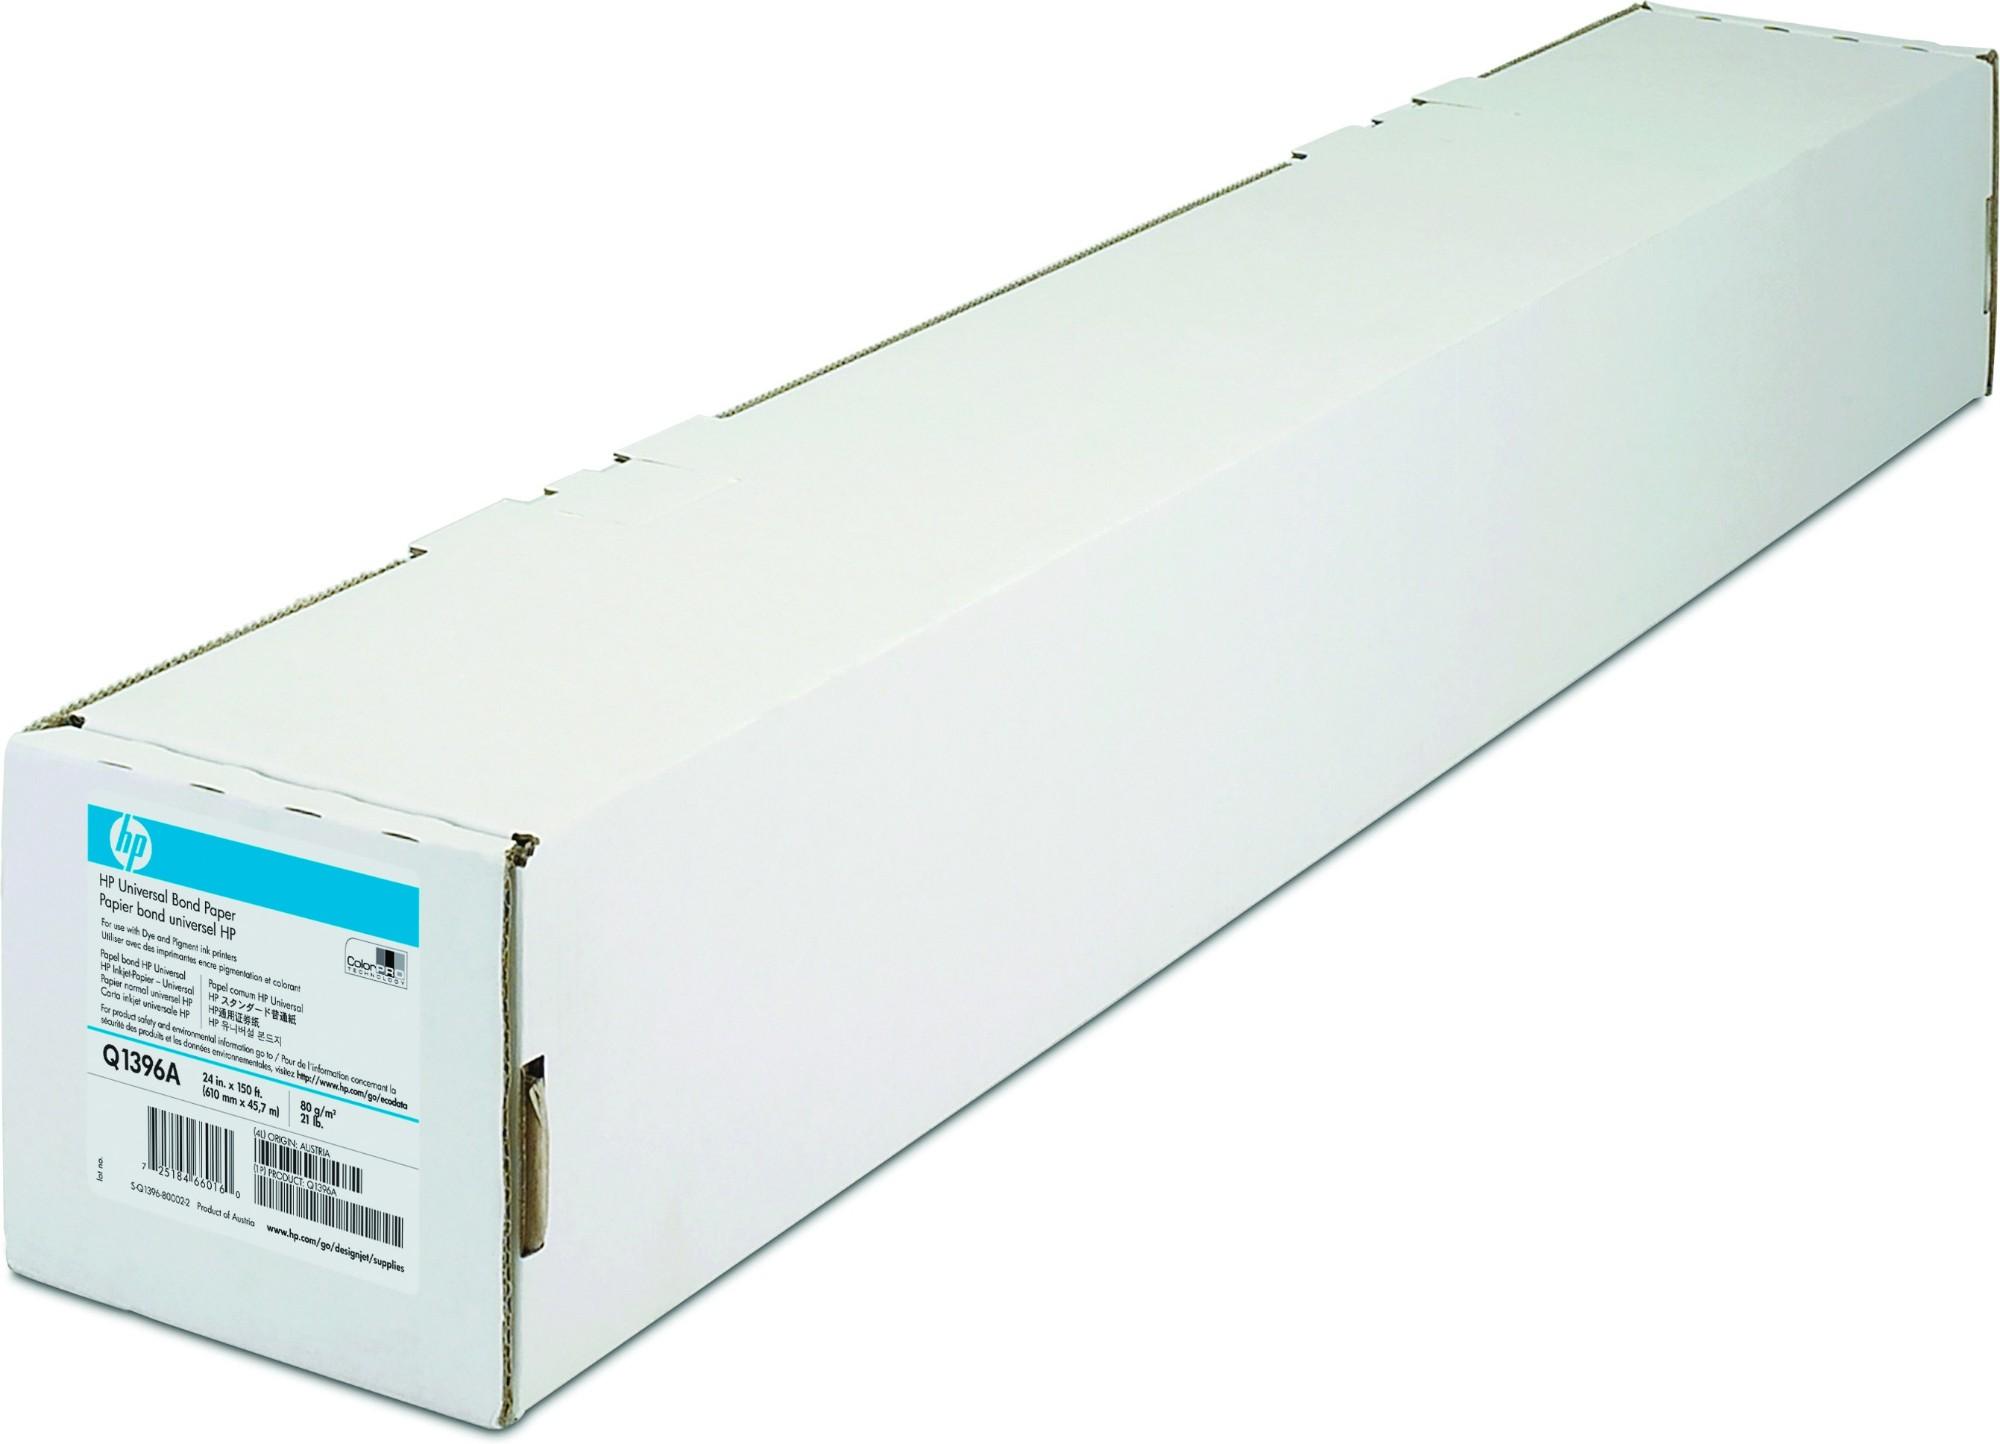 HP Universal Bond Paper 80 gsm-610 mm x 45.7 m (24 in x 150 ft) printing paper Matte